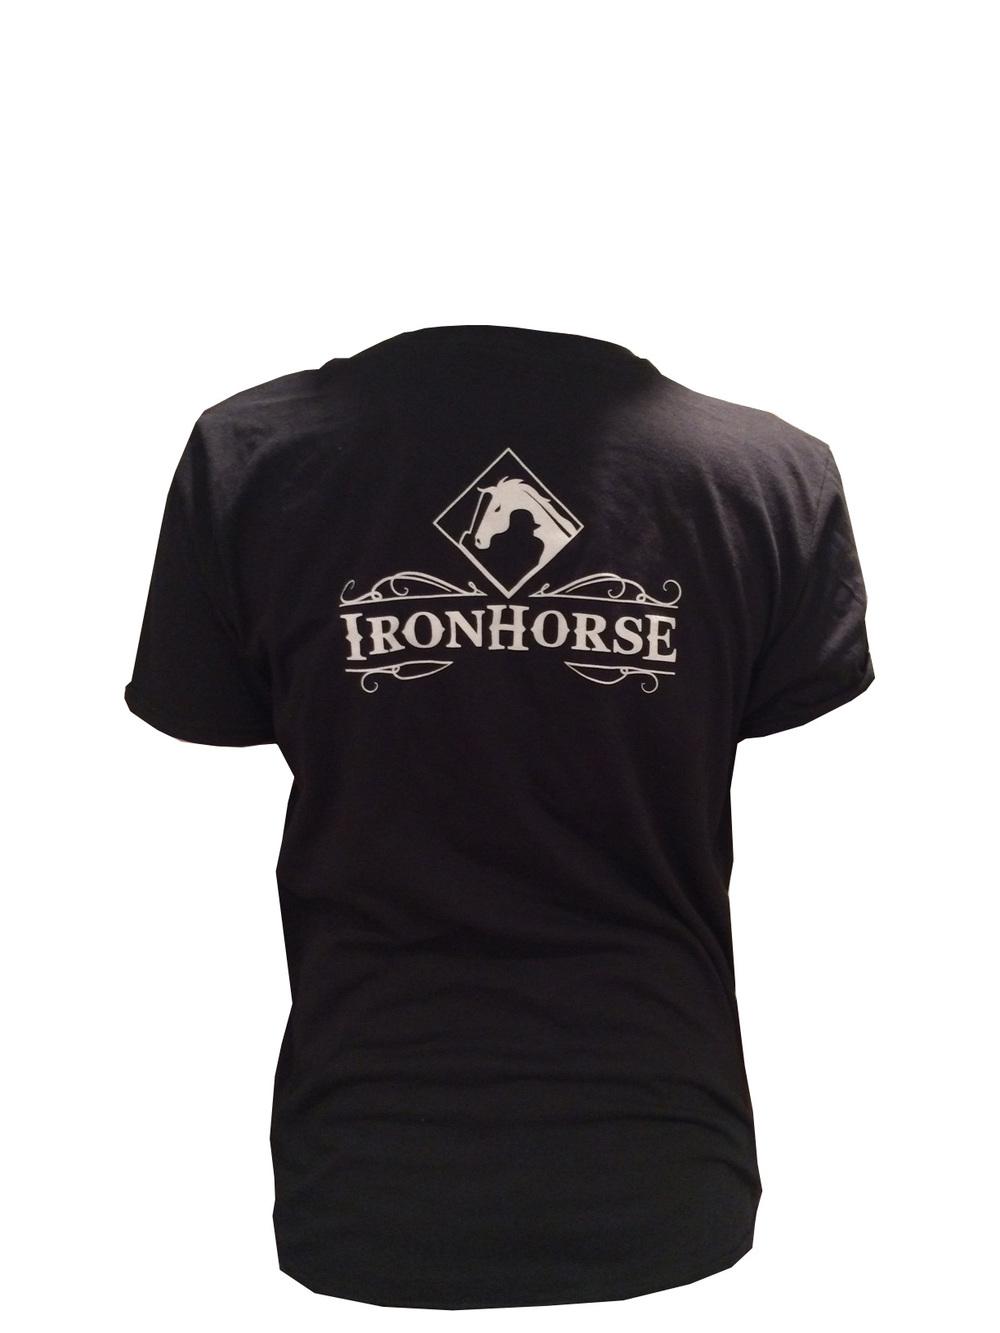 IronHorse Ball Unisex Tshirt